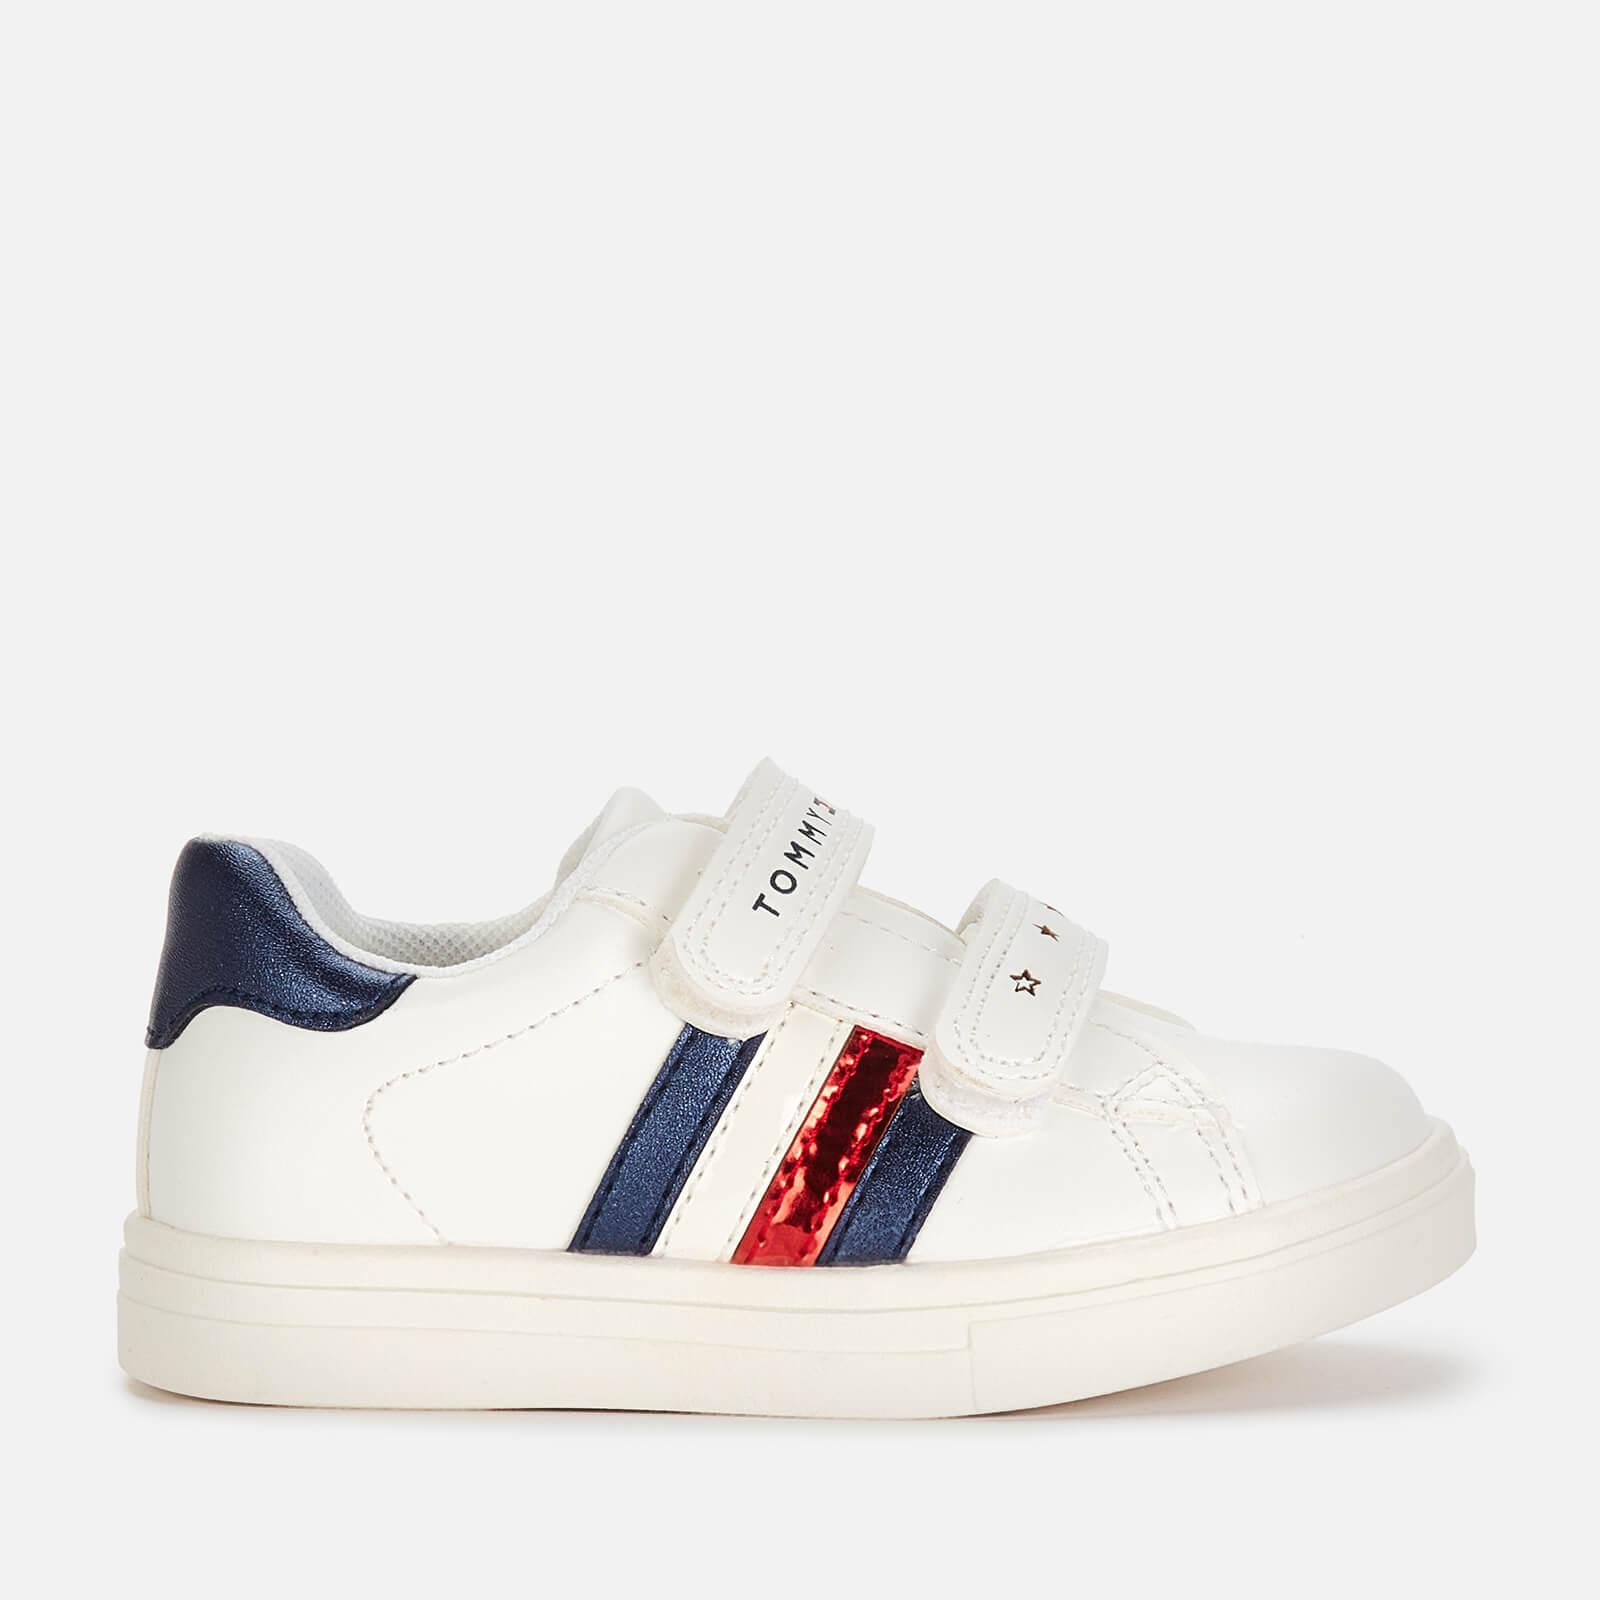 Tommy Hilfiger Girls' Low Cut Velcro Shoe - White/Blue - UK 4.5 Toddler